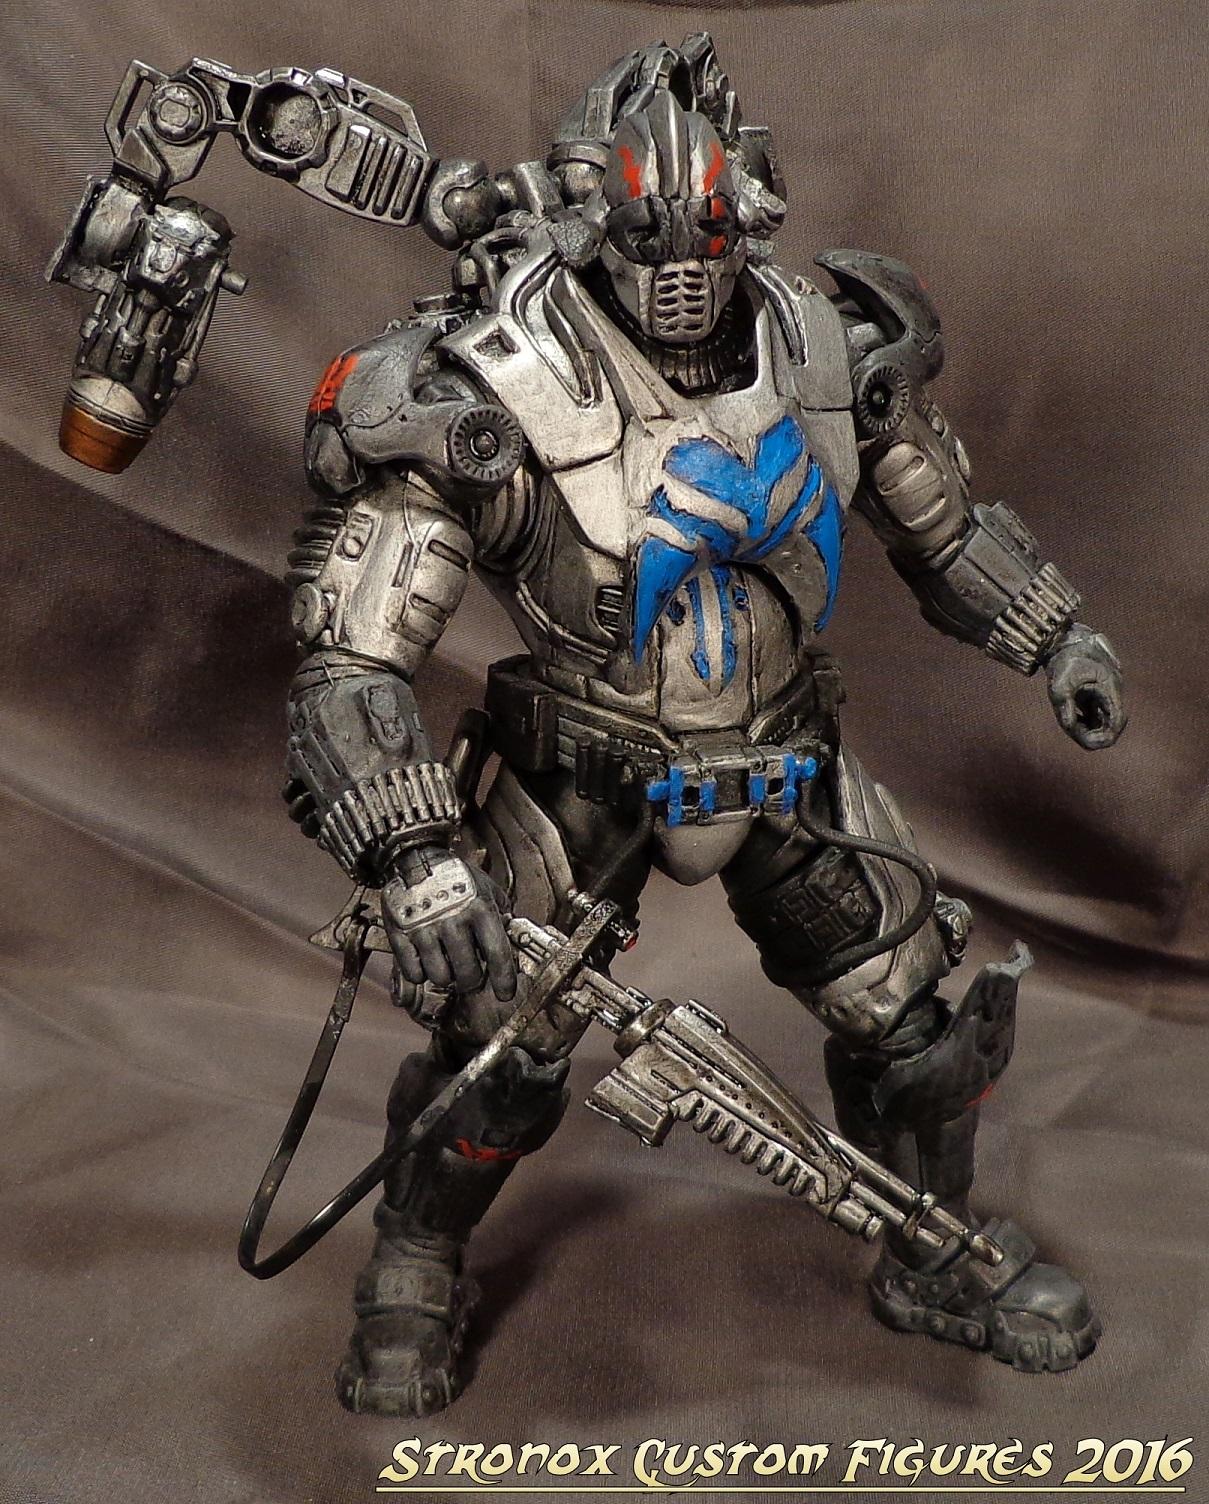 Stronox Custom Figures: Star Wars: Durge